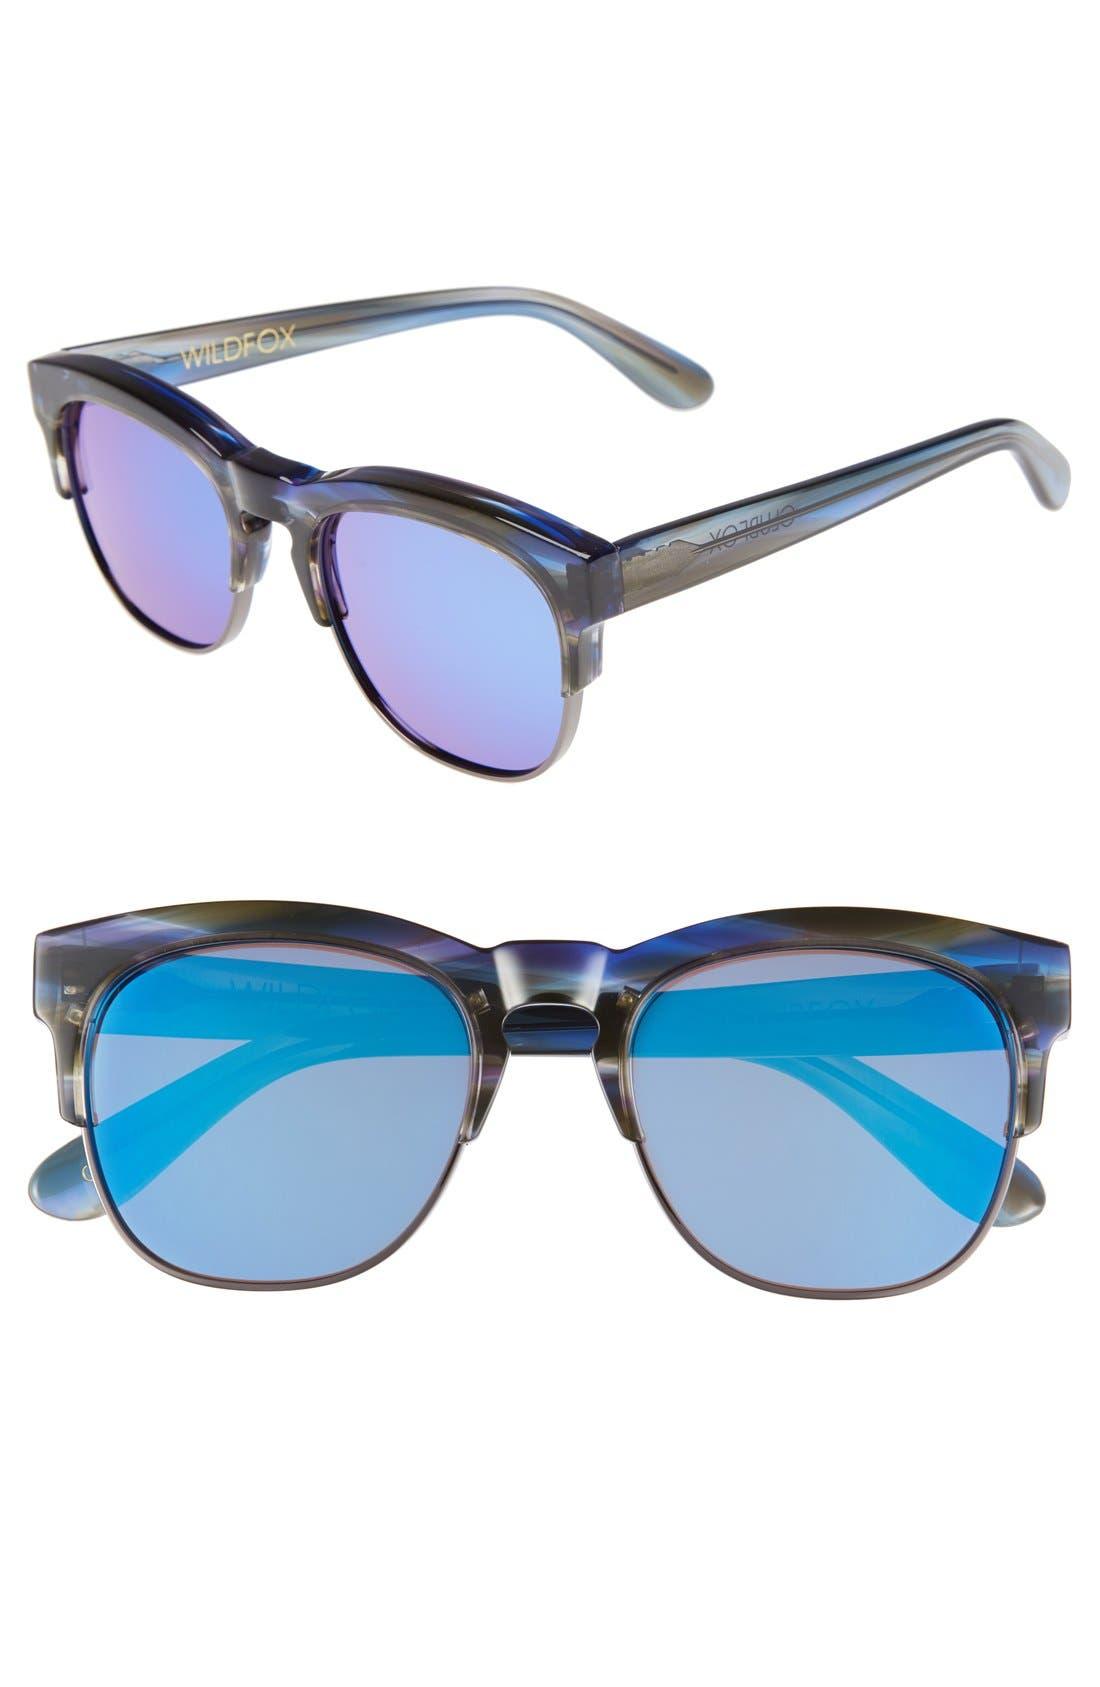 WILDFOX, 'Club Fox Deluxe' 52mm Sunglasses, Main thumbnail 1, color, 020